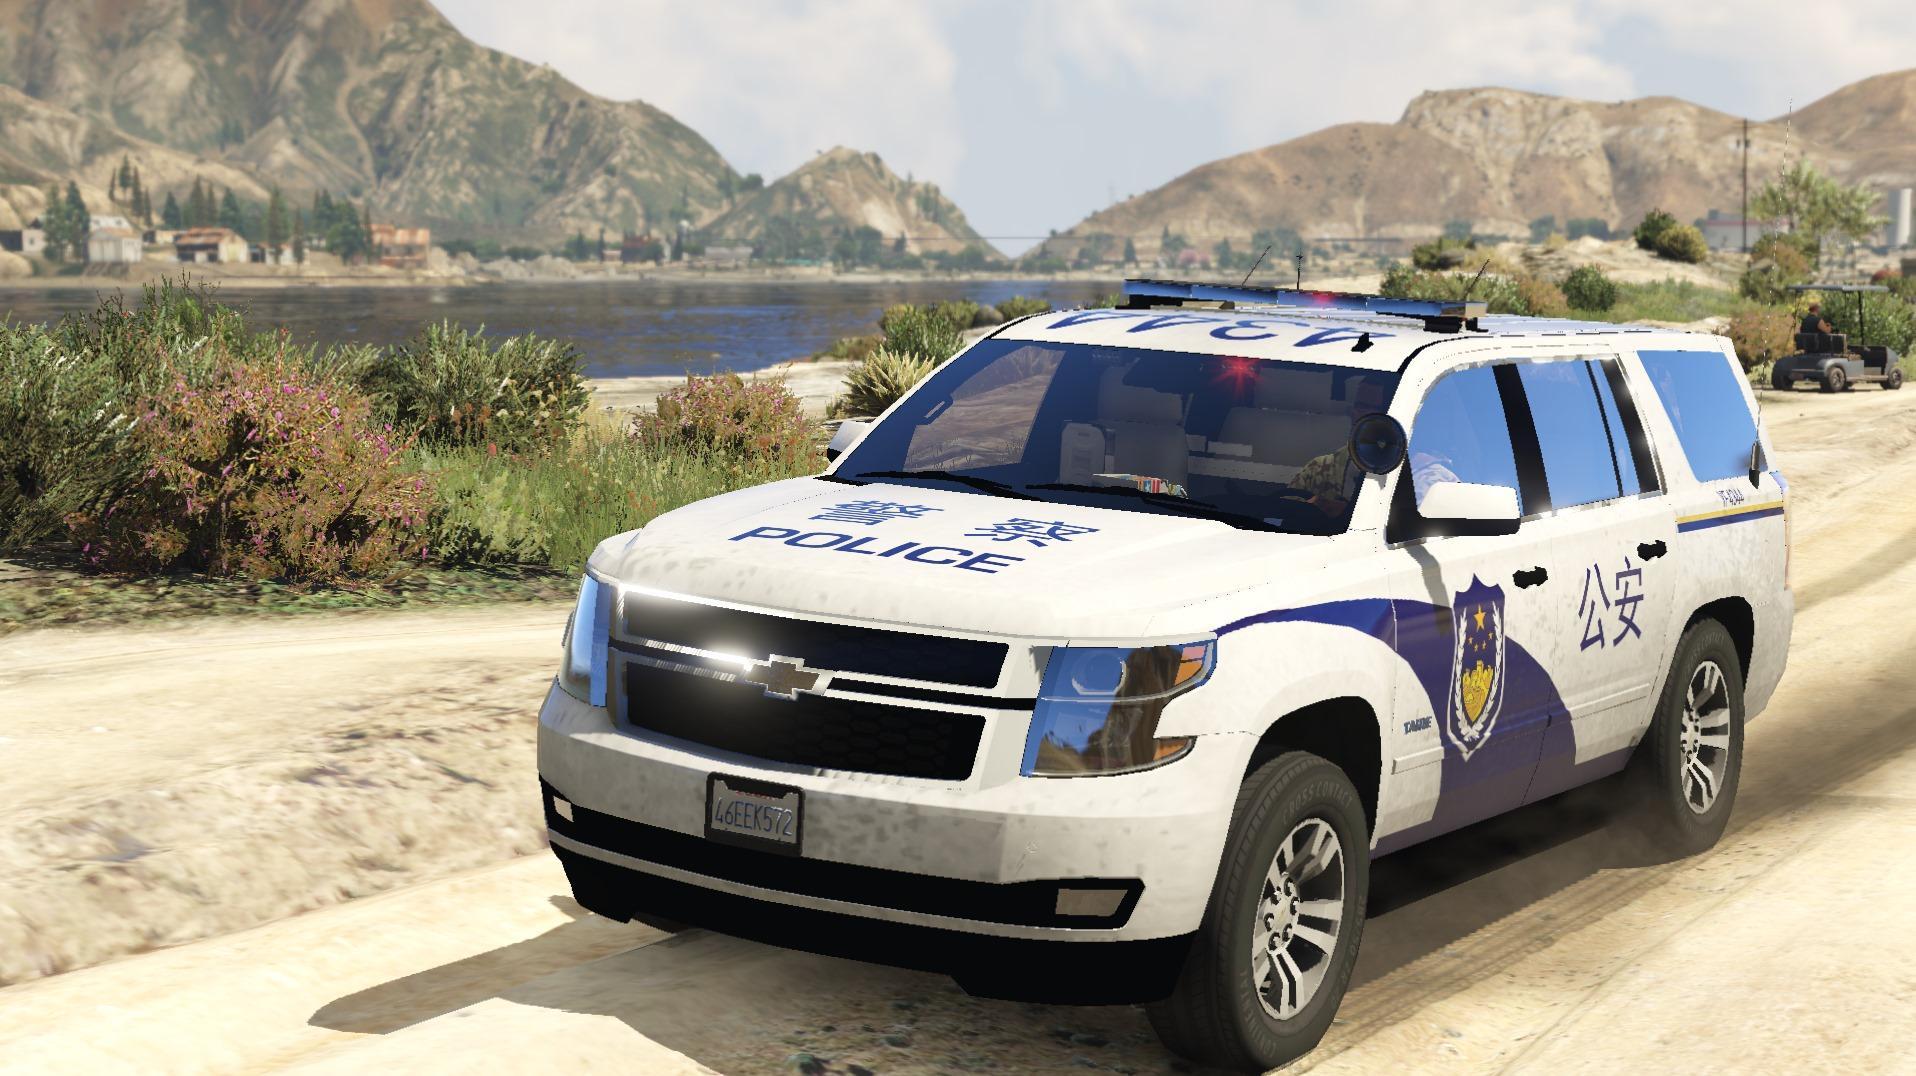 2015 Chevrolet Tahoe Chinese Police Gta5 Mods Com